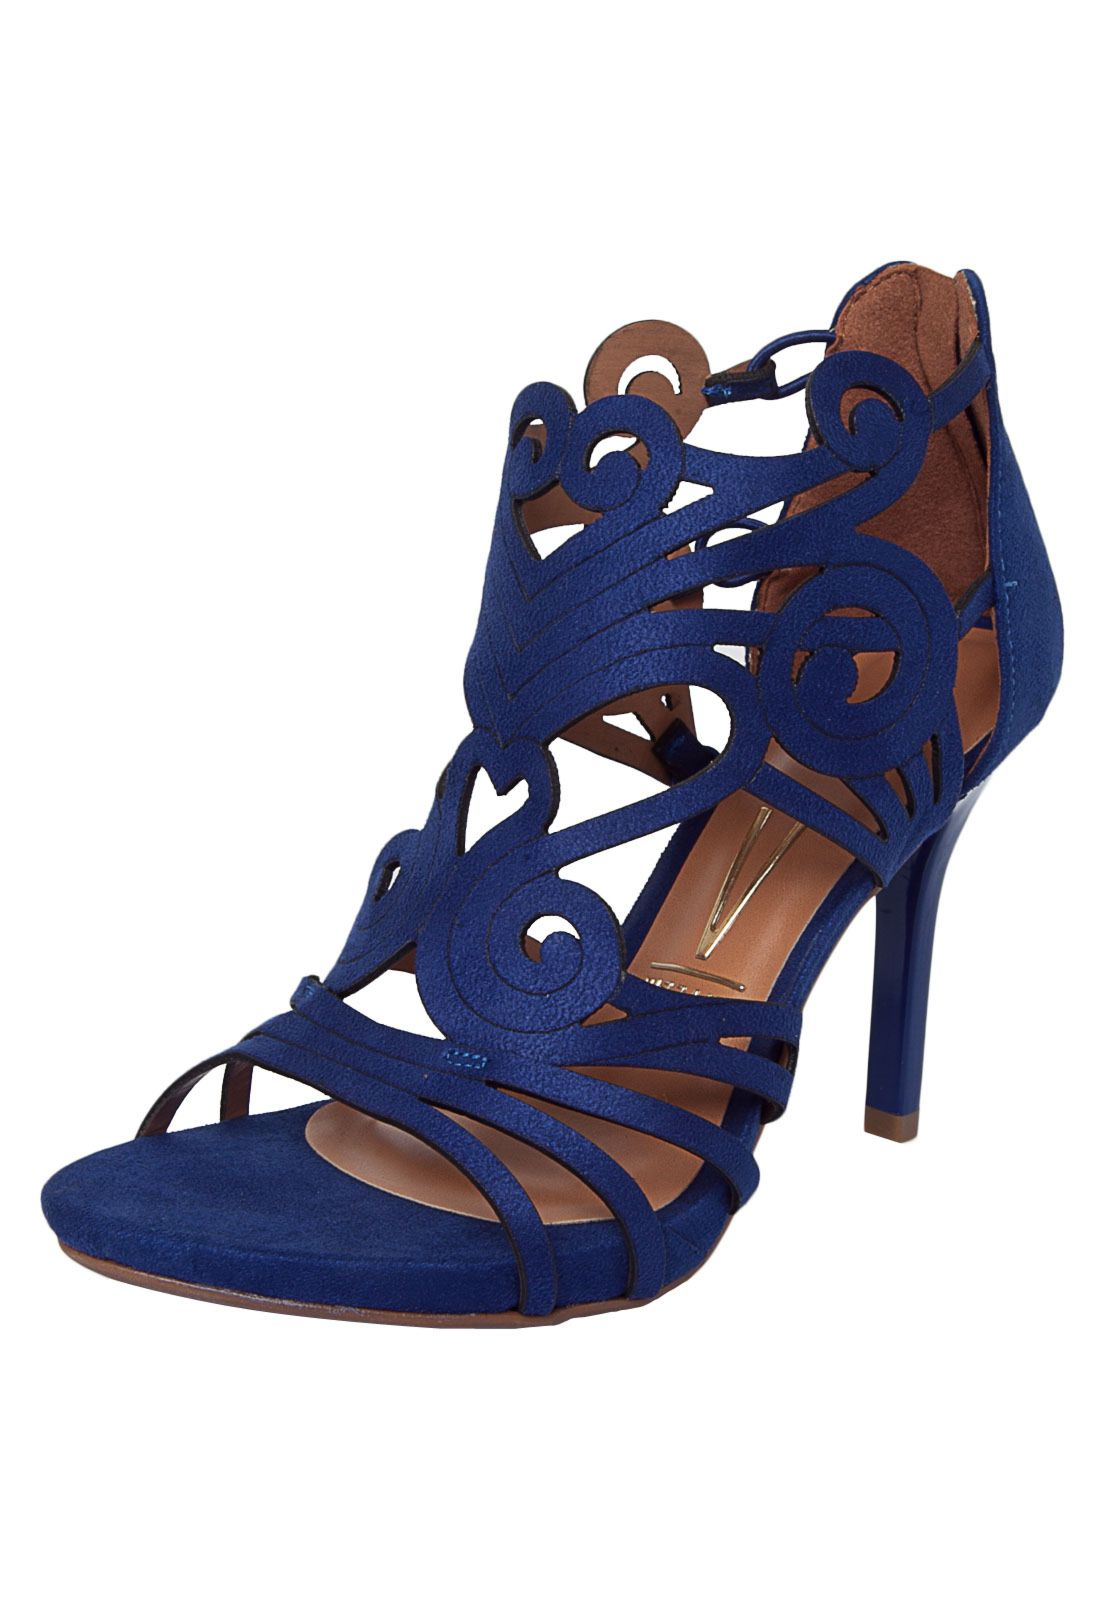 c2095612b Sandália Vizzano Camurça Azul - Compre Agora